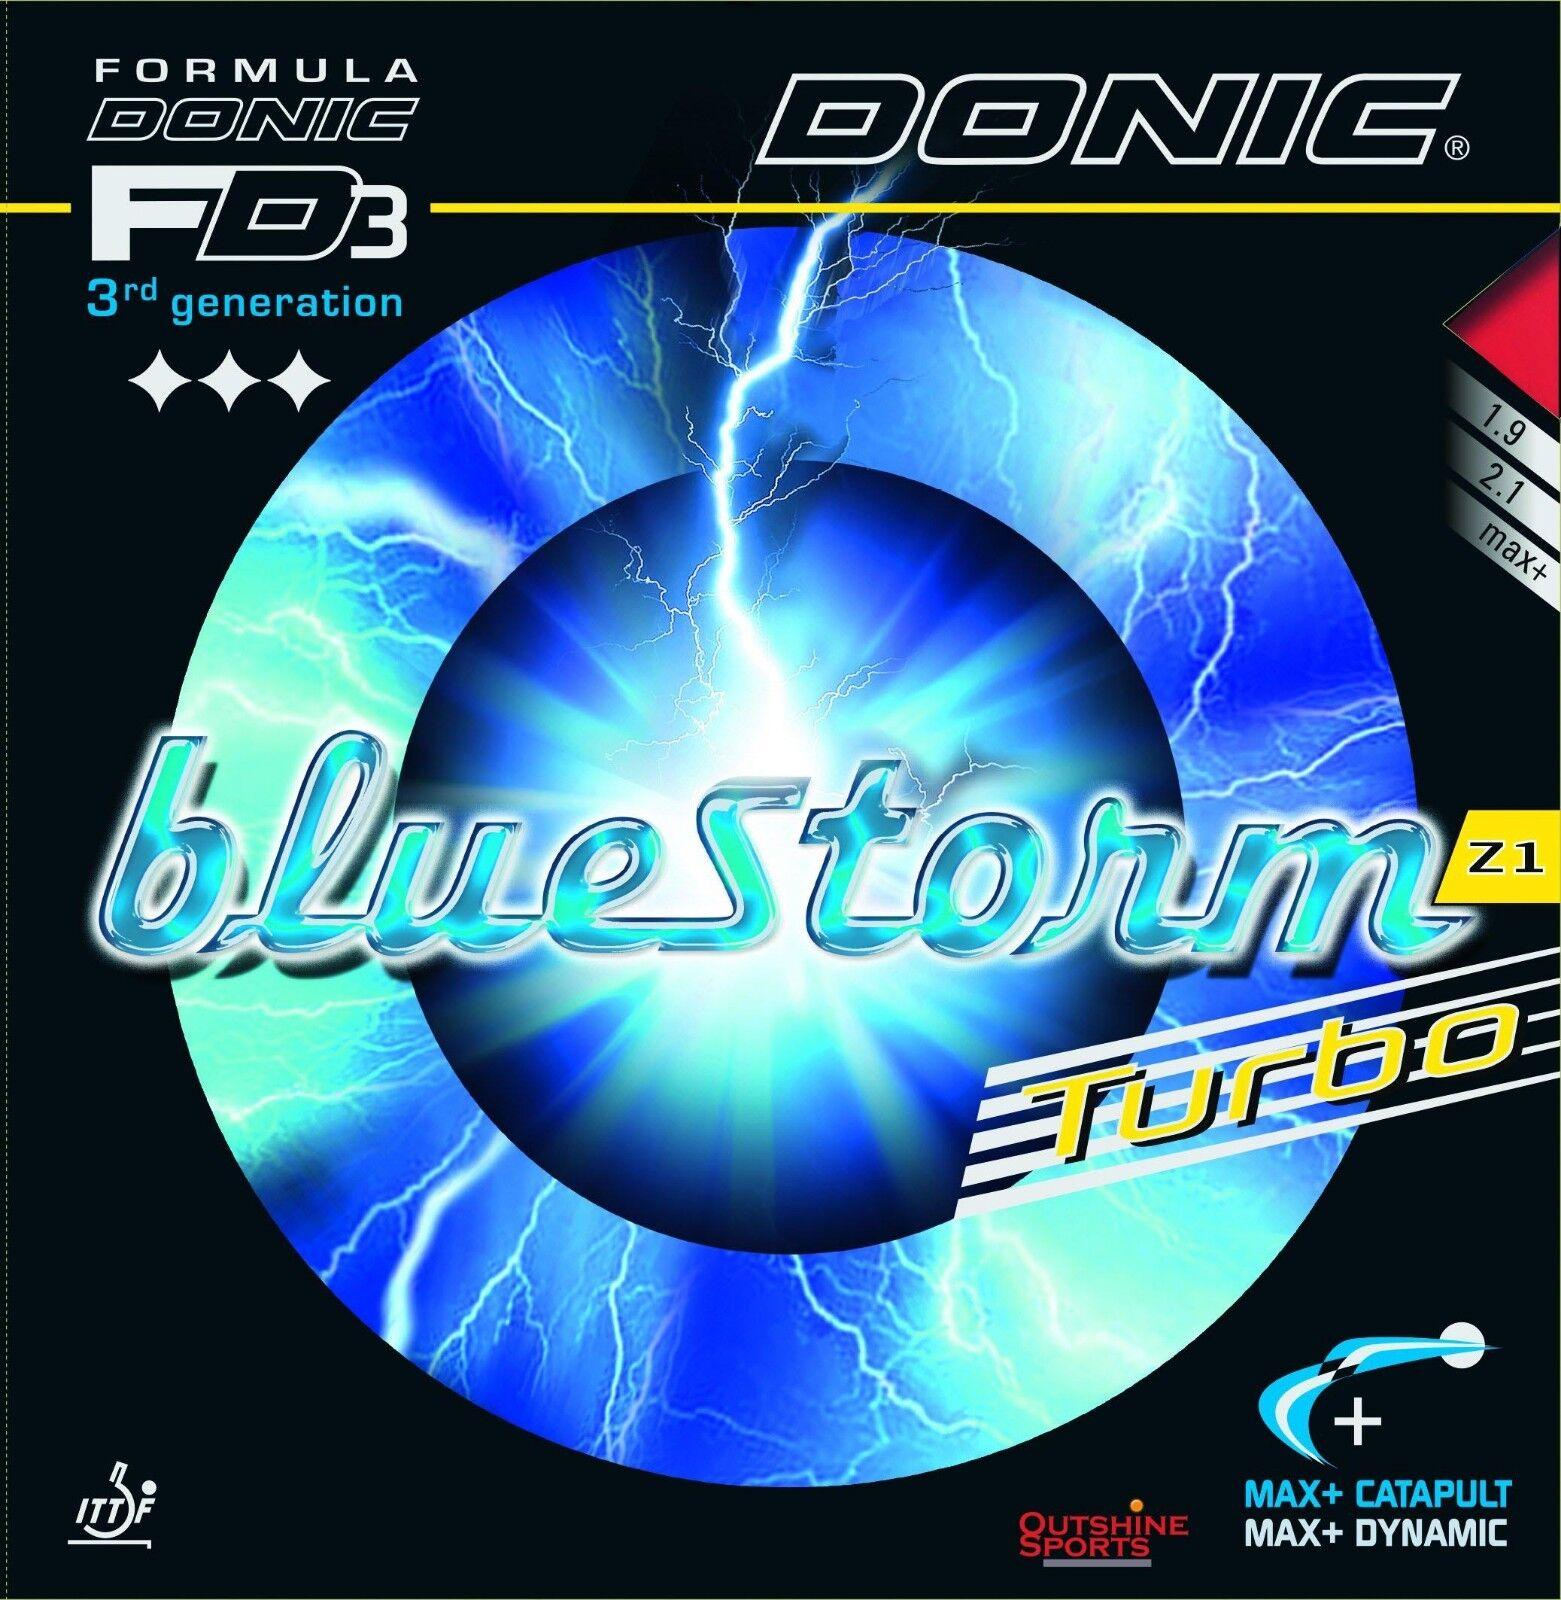 Donic blueeStorm Z1 Turbo Table Tennis Rubber